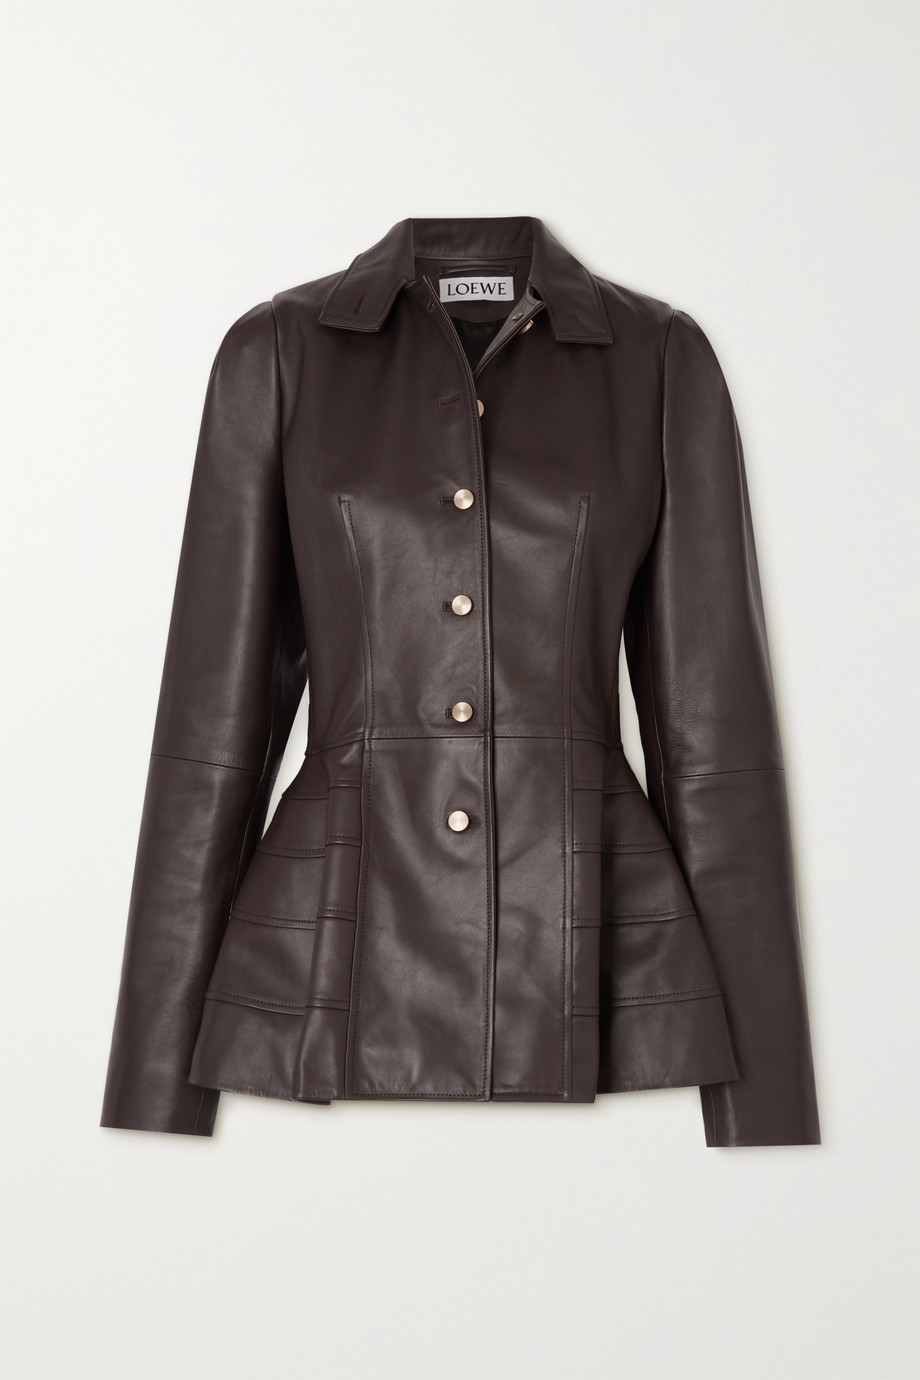 Loewe Paneled leather peplum jacket